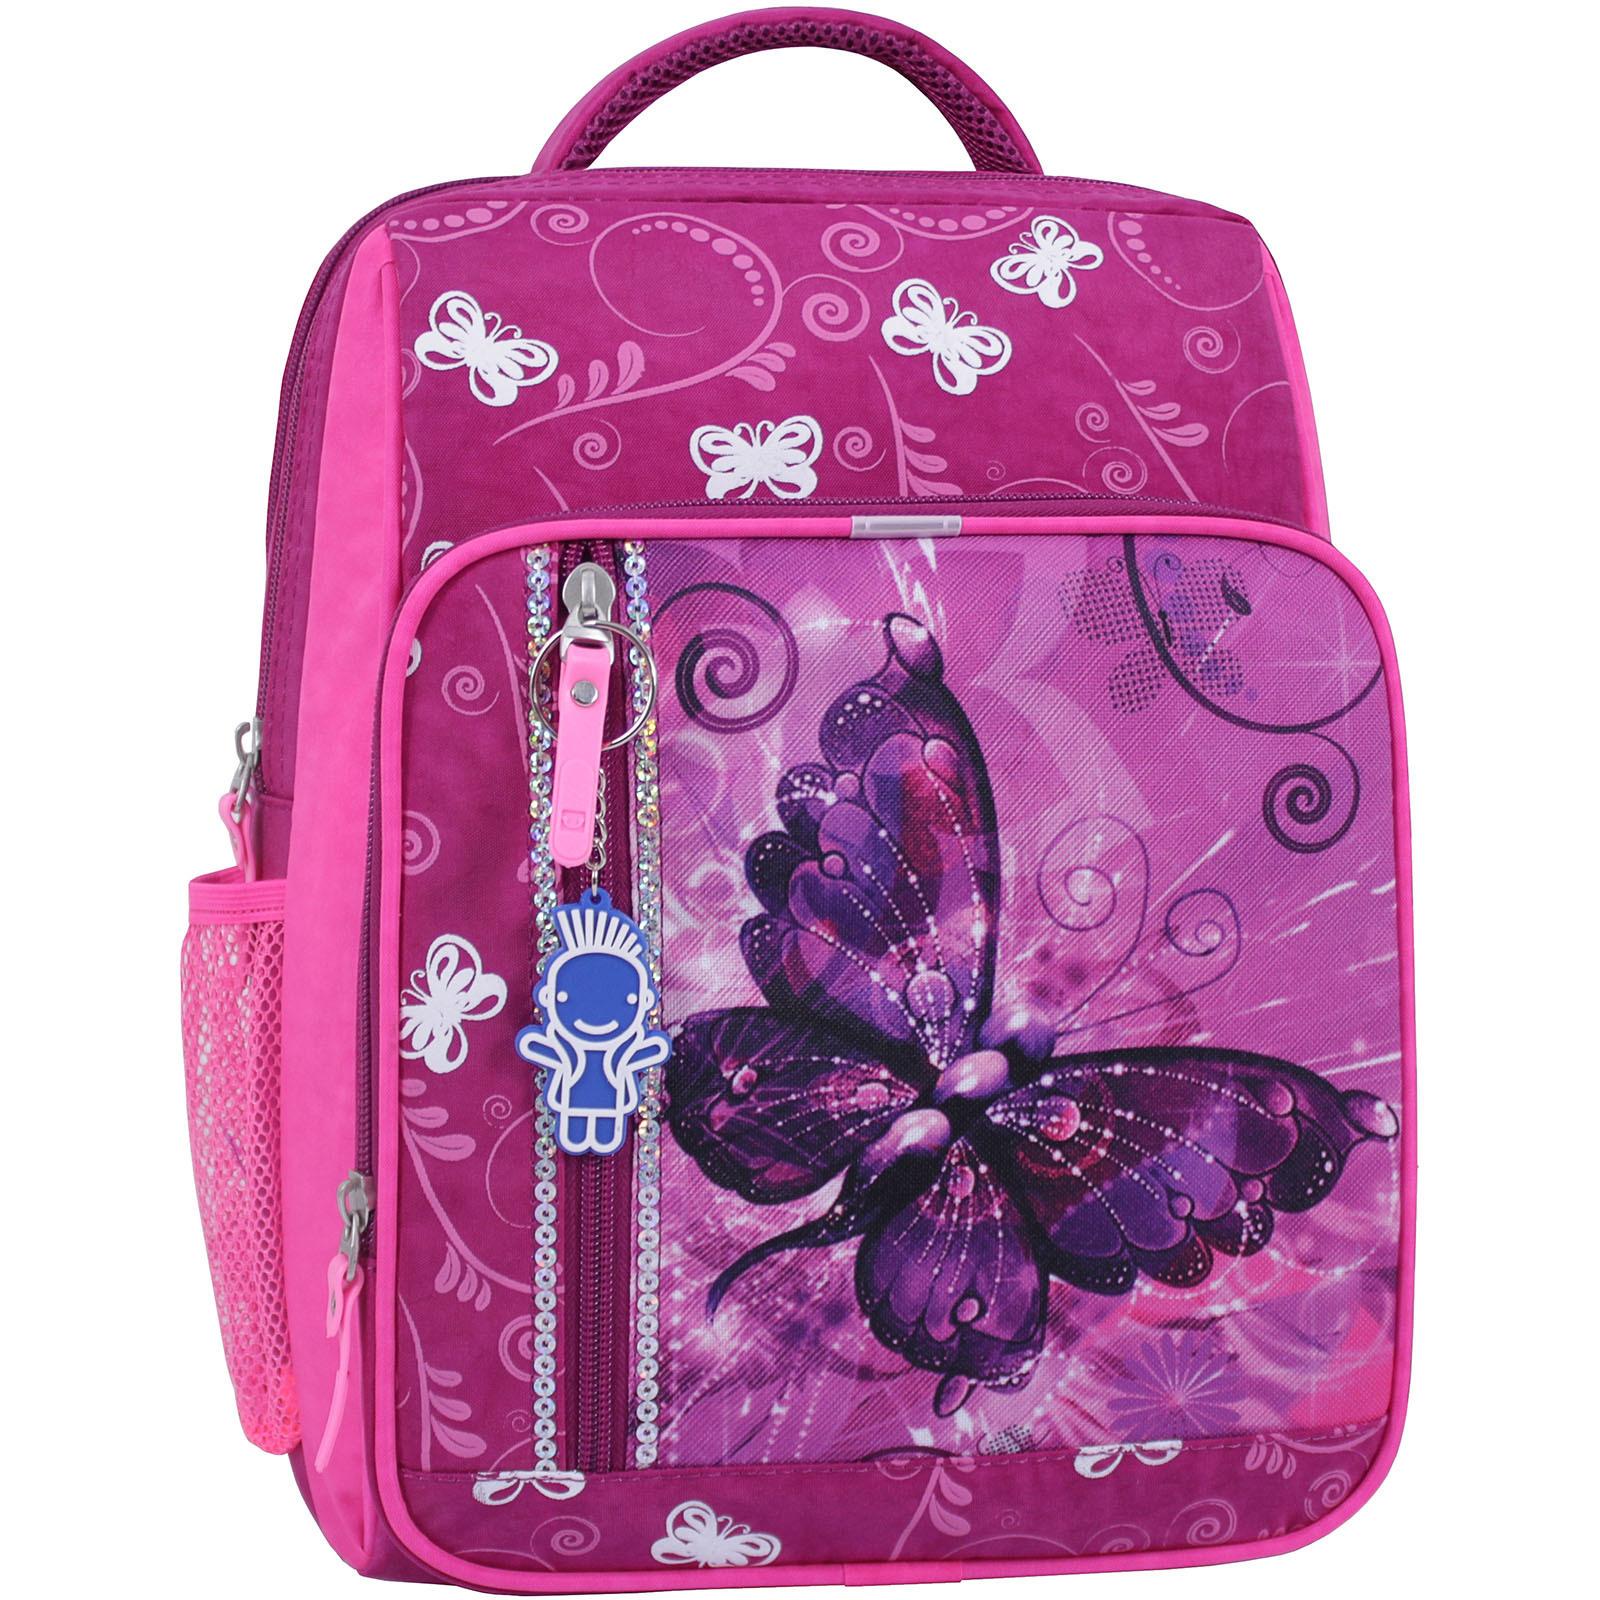 Школьные рюкзаки Рюкзак школьный Bagland Школьник 8 л. 143 малина 615 (00112702) IMG_1619_суб.615_.JPG